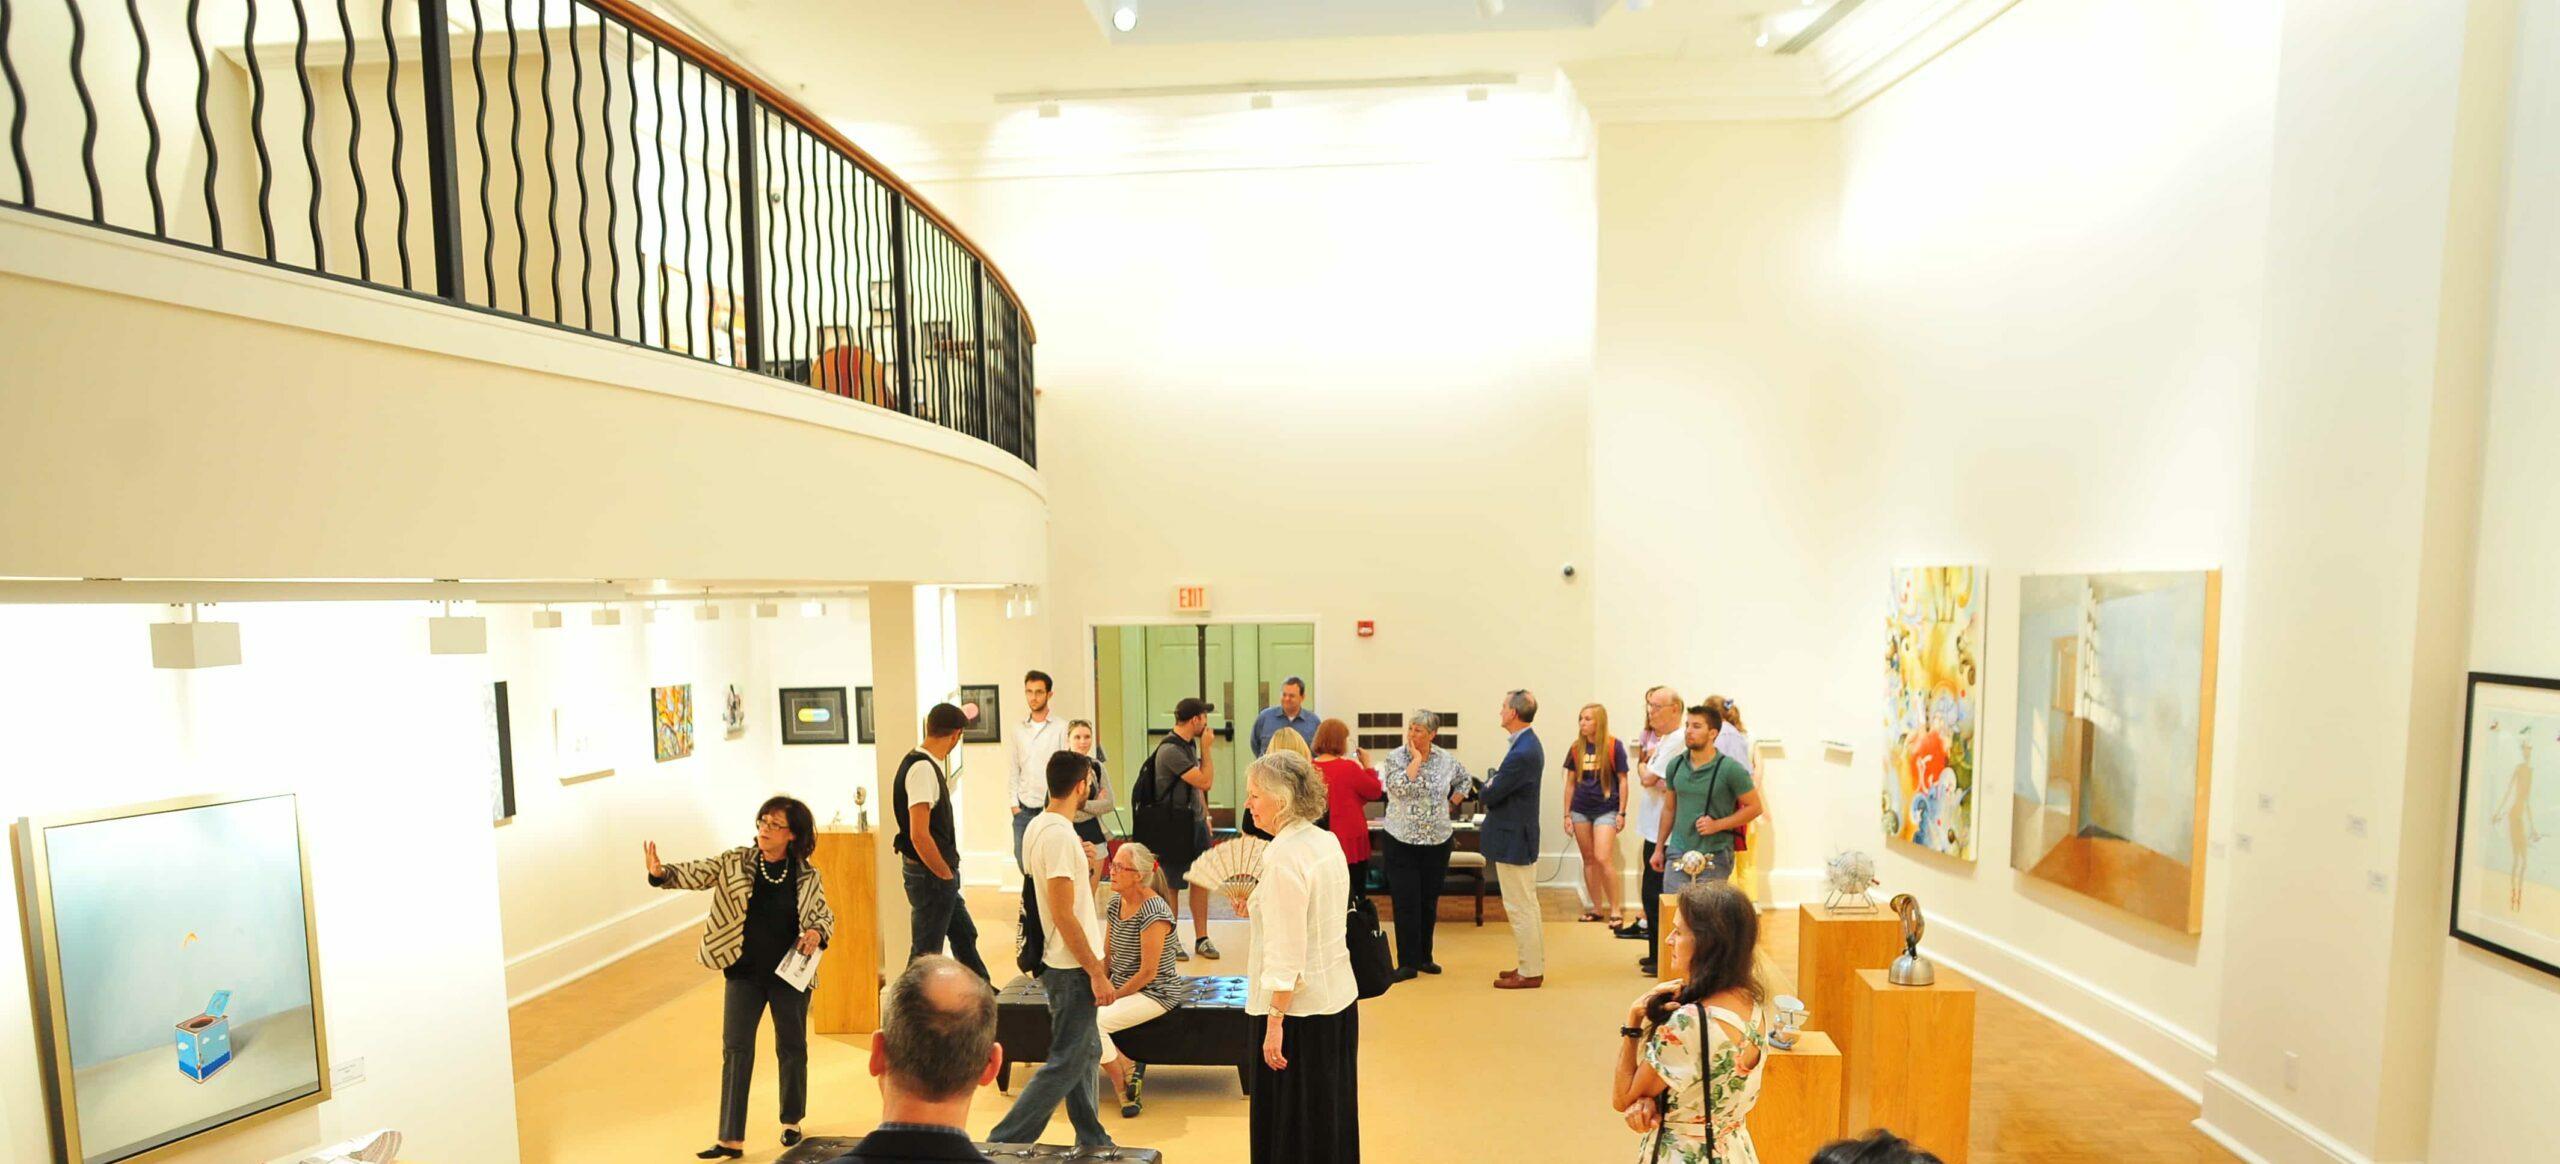 Welcome to HPUs Darrell E. Sechrest Art Gallery